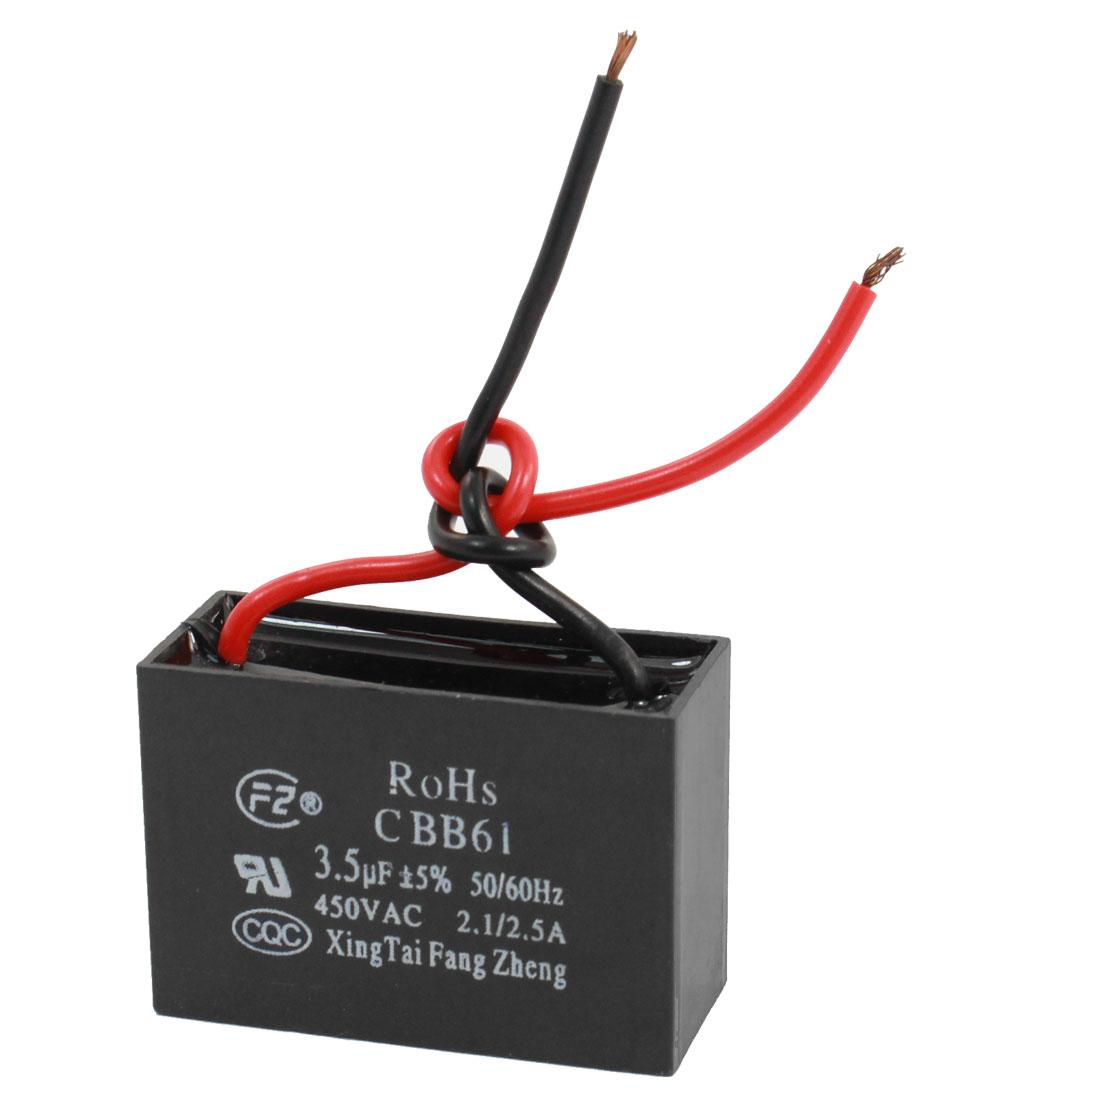 AC 450V 50/60Hz Rectangle Dual Wire Motor Run Capacitor 3.5uF CBB61